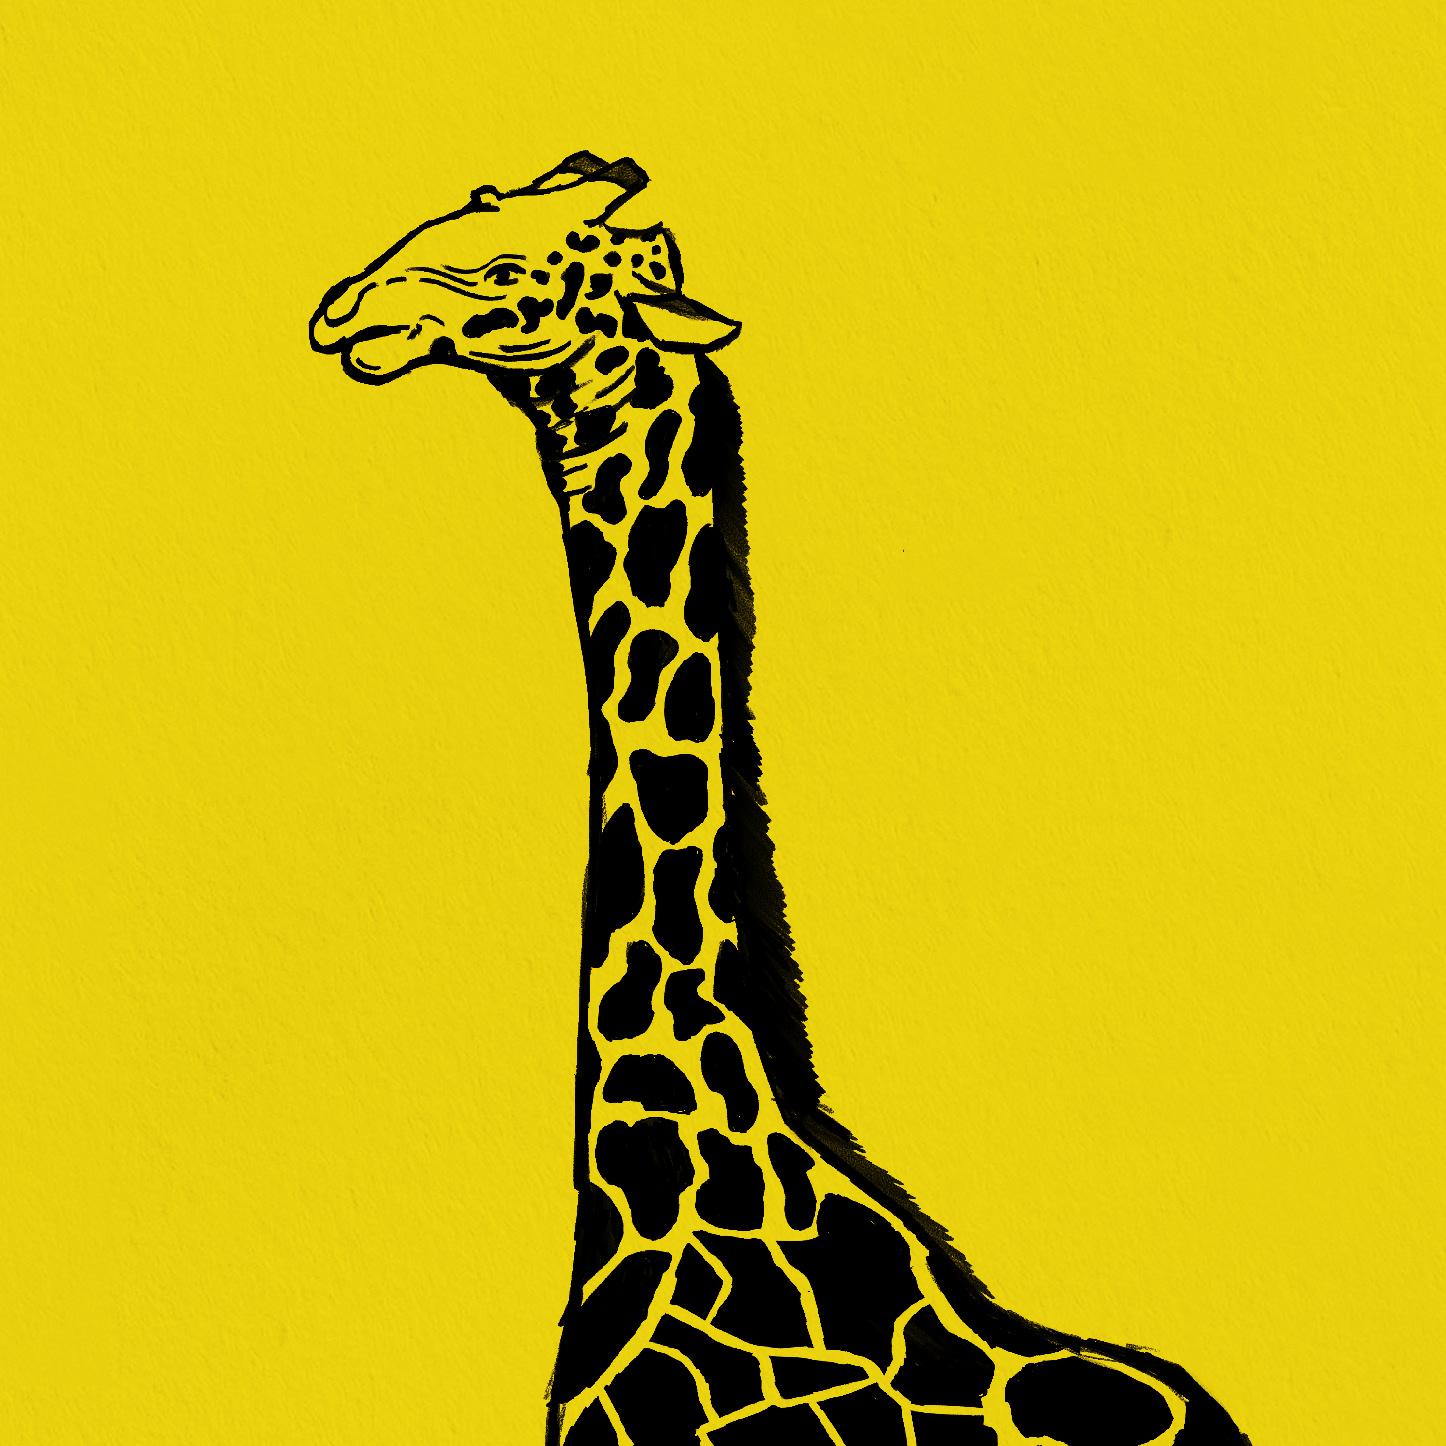 Giraffe 2 Print zoomed